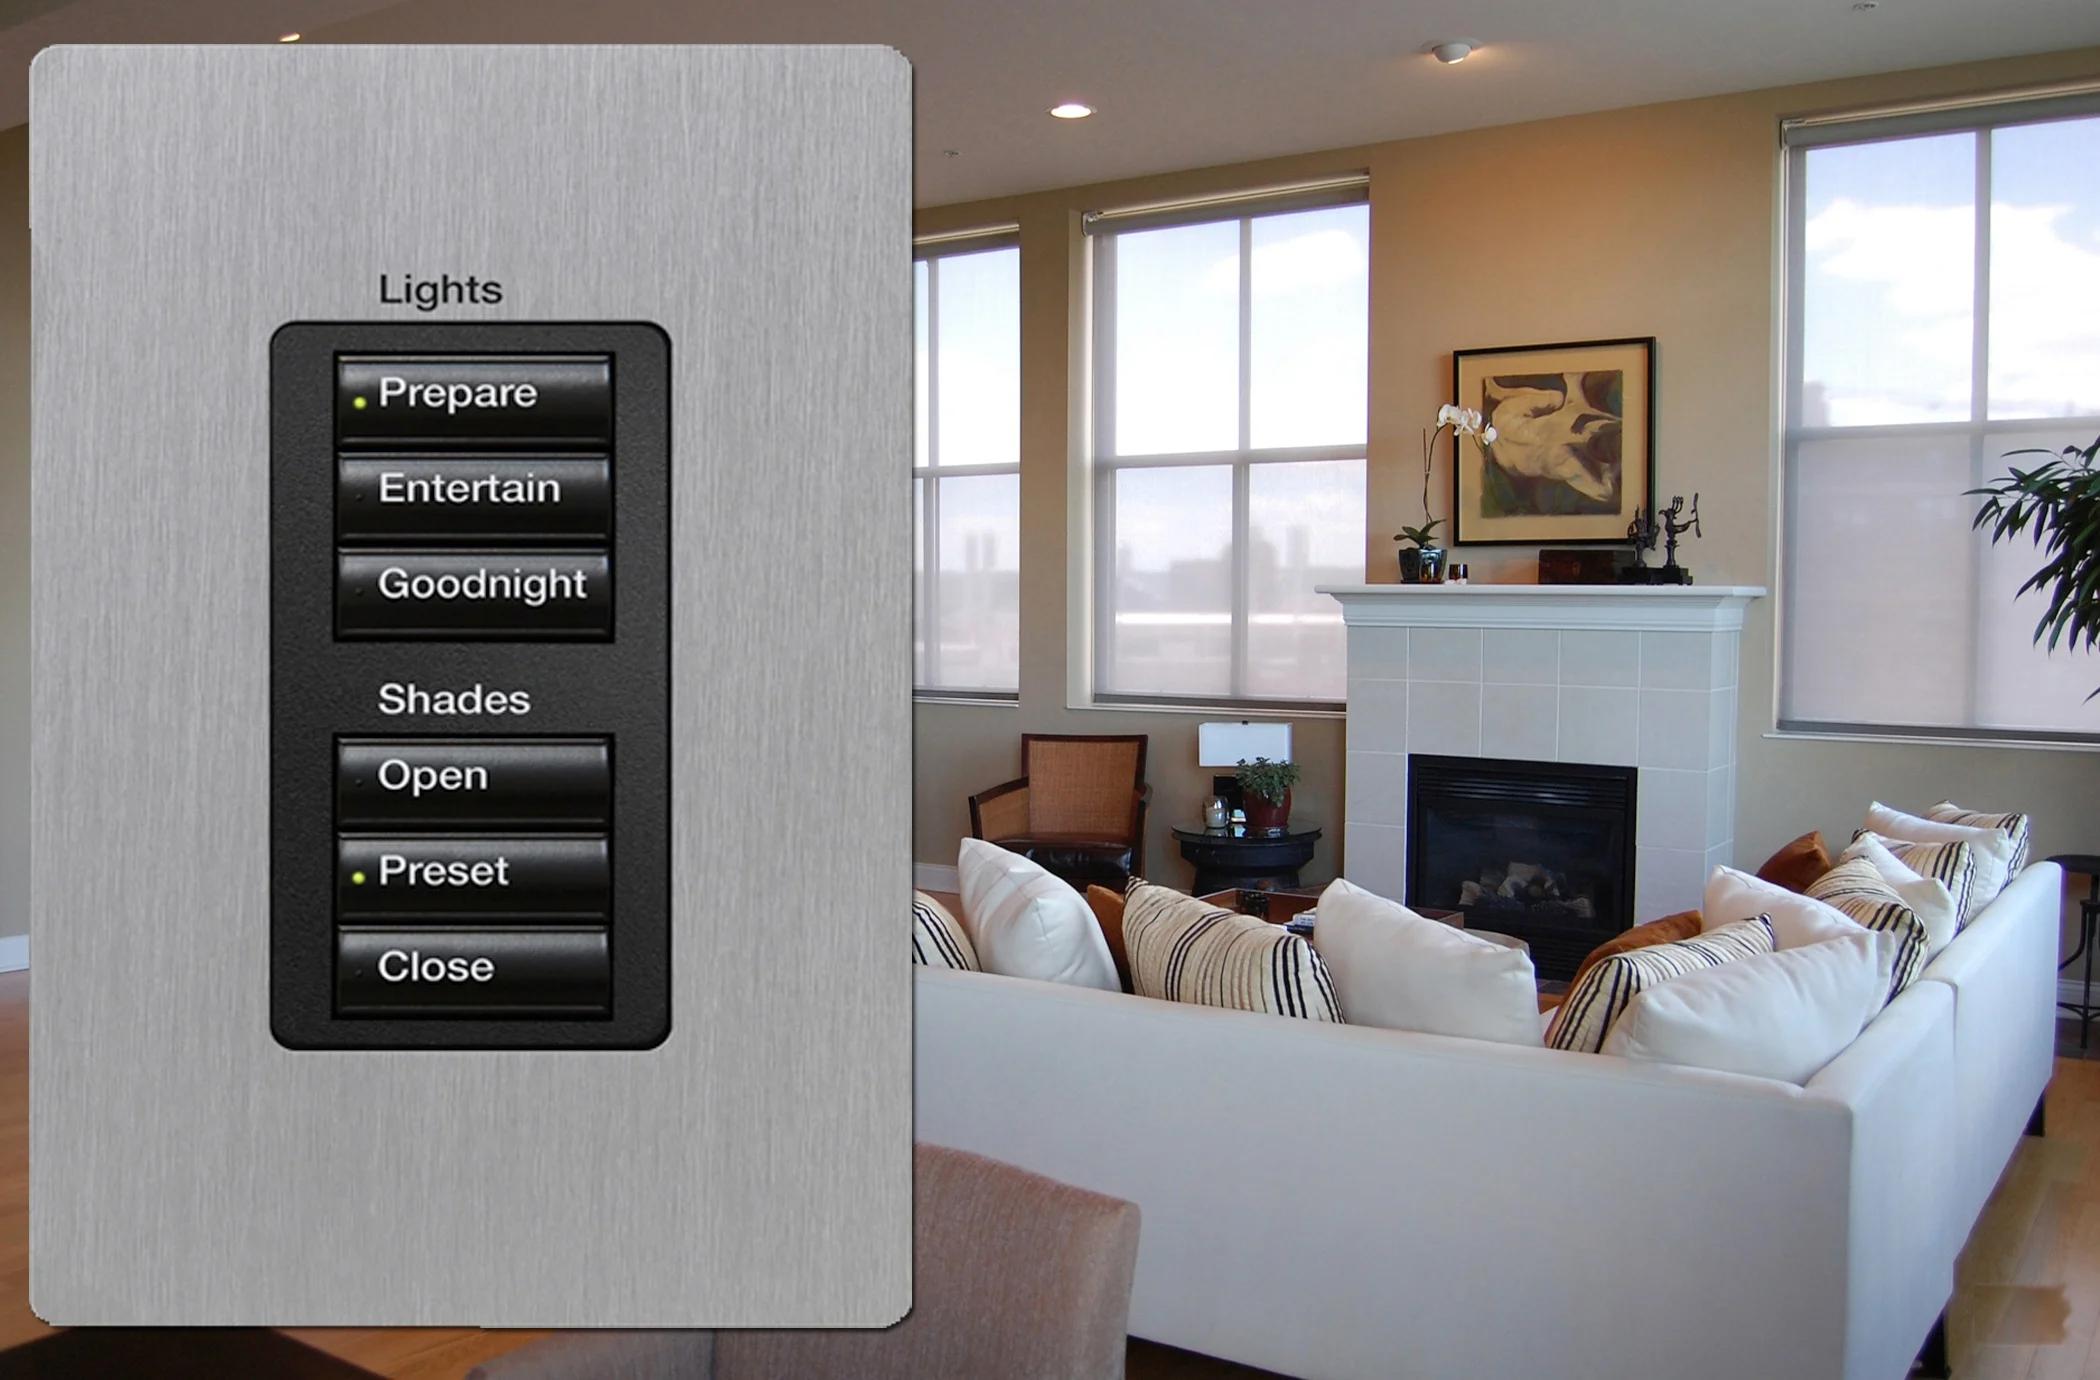 smart-lighting-controls